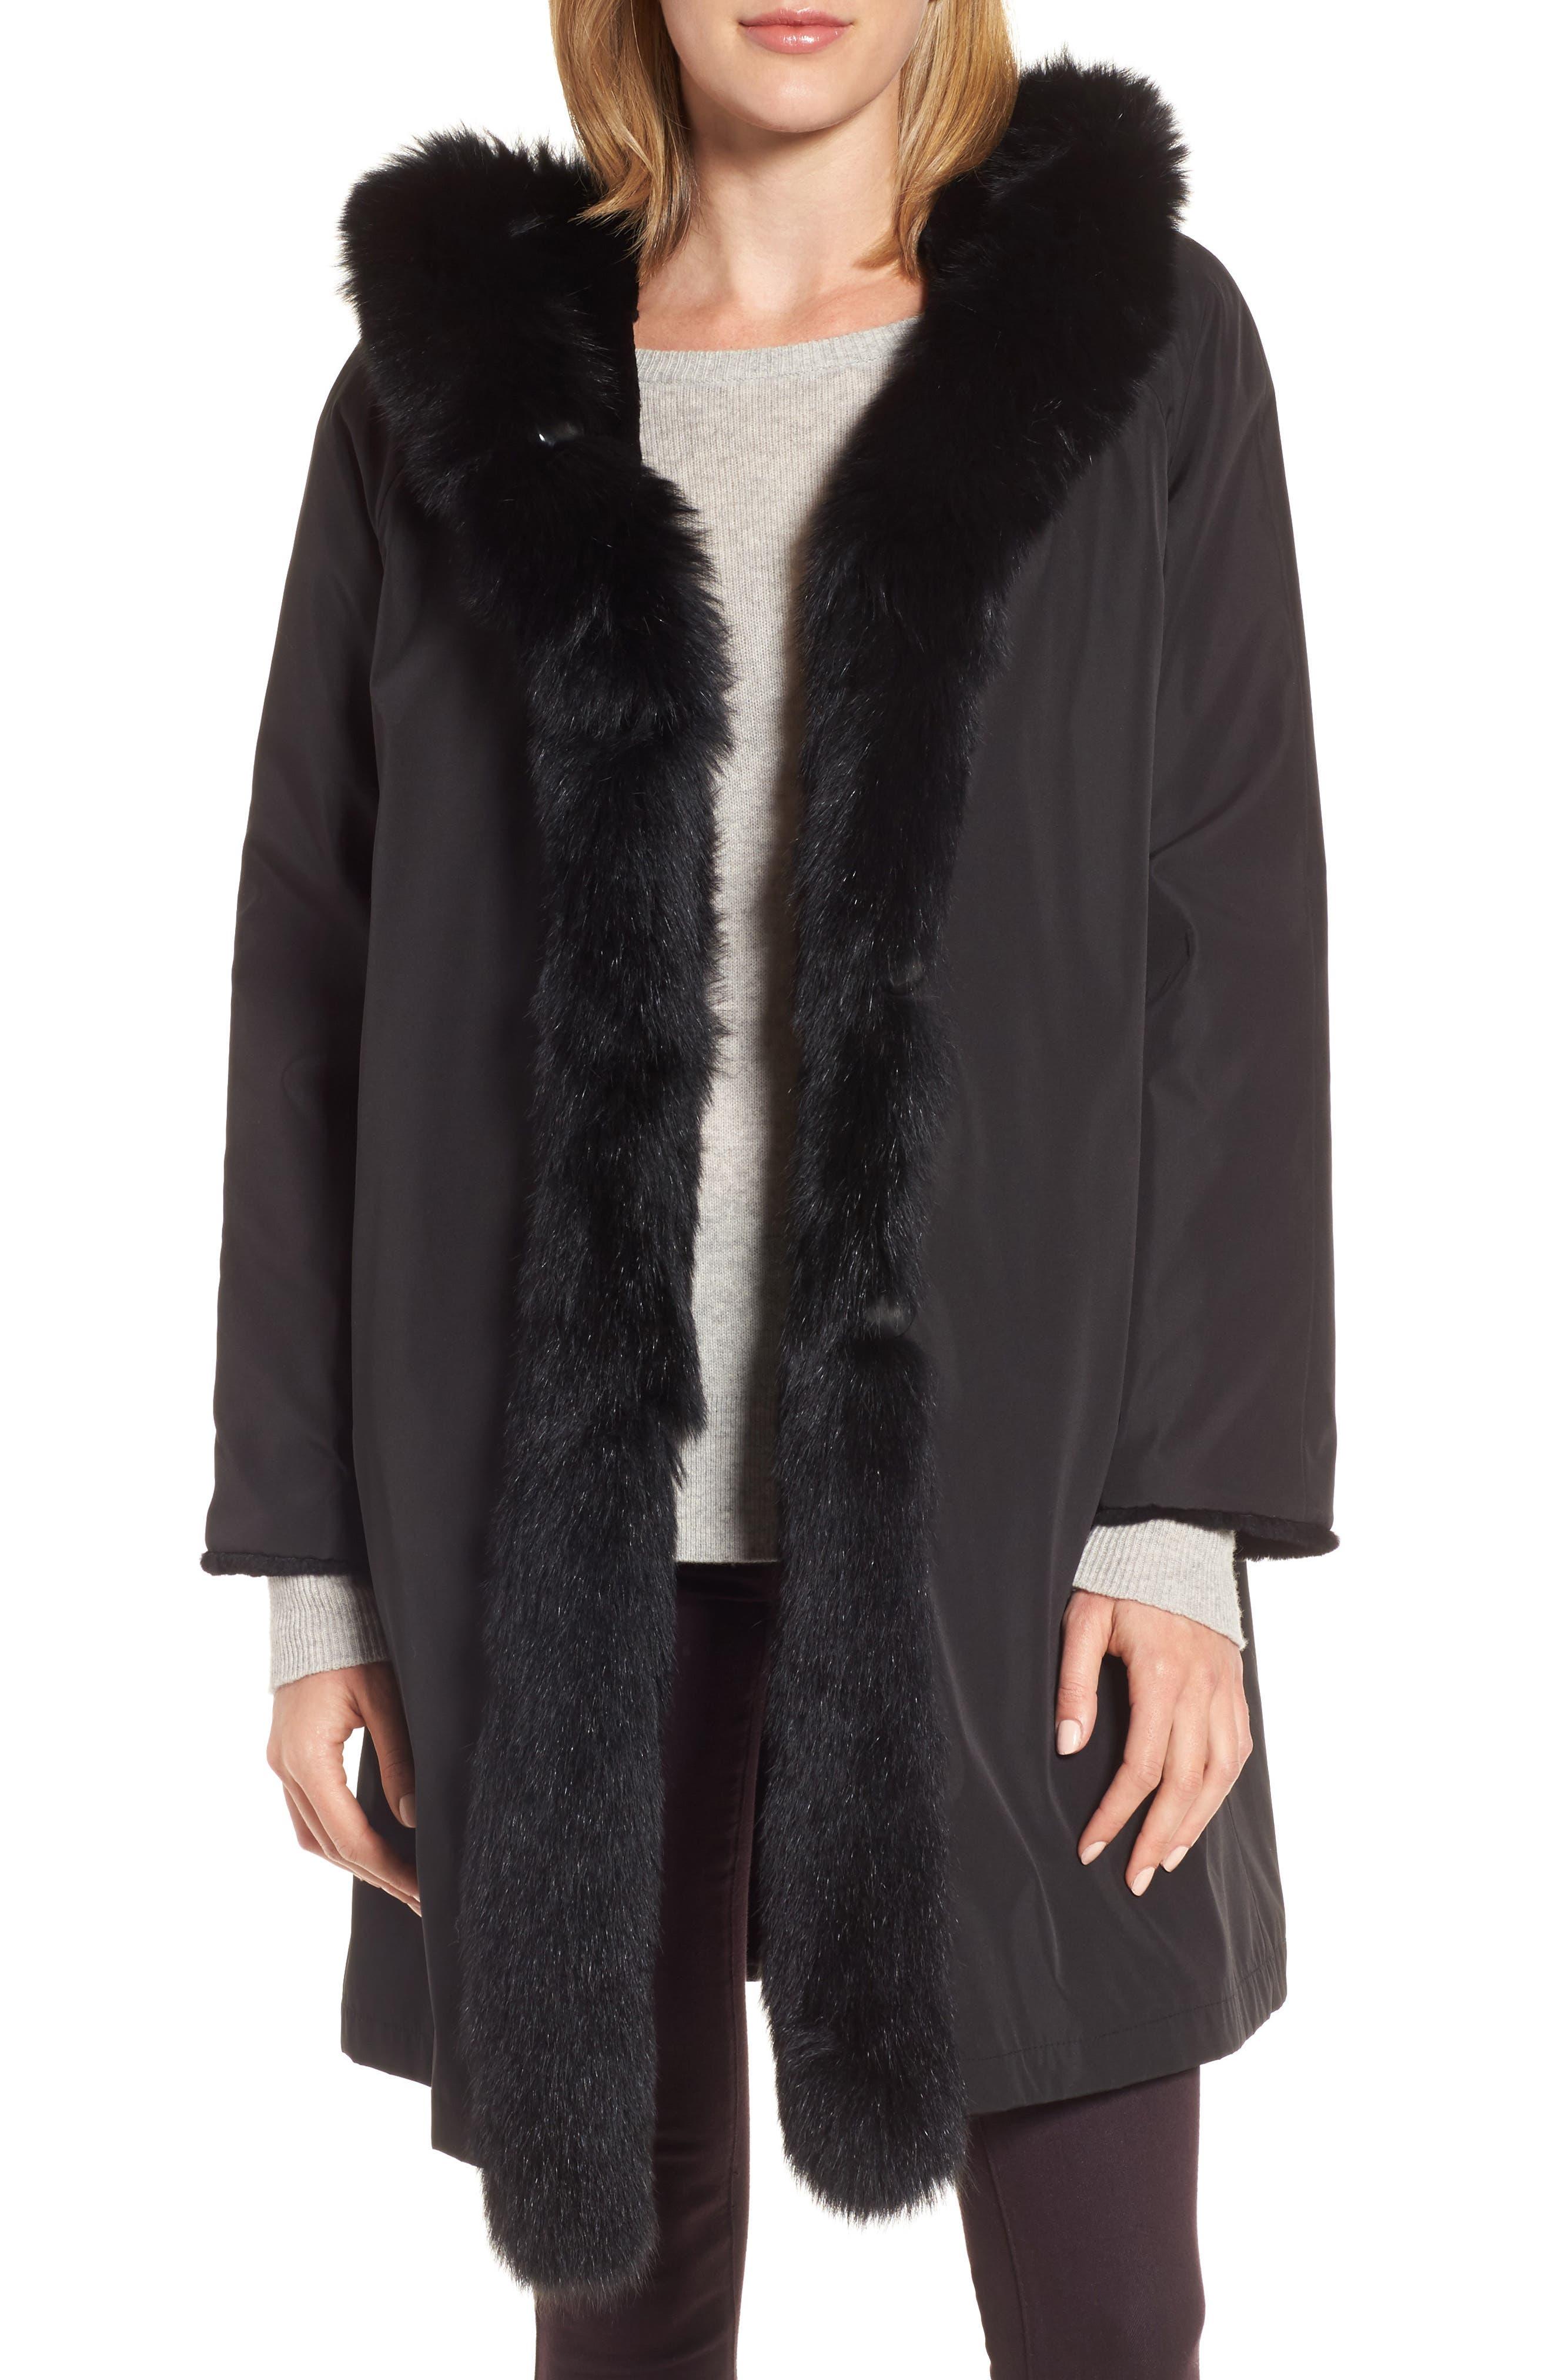 Duffle coat with real fur hood